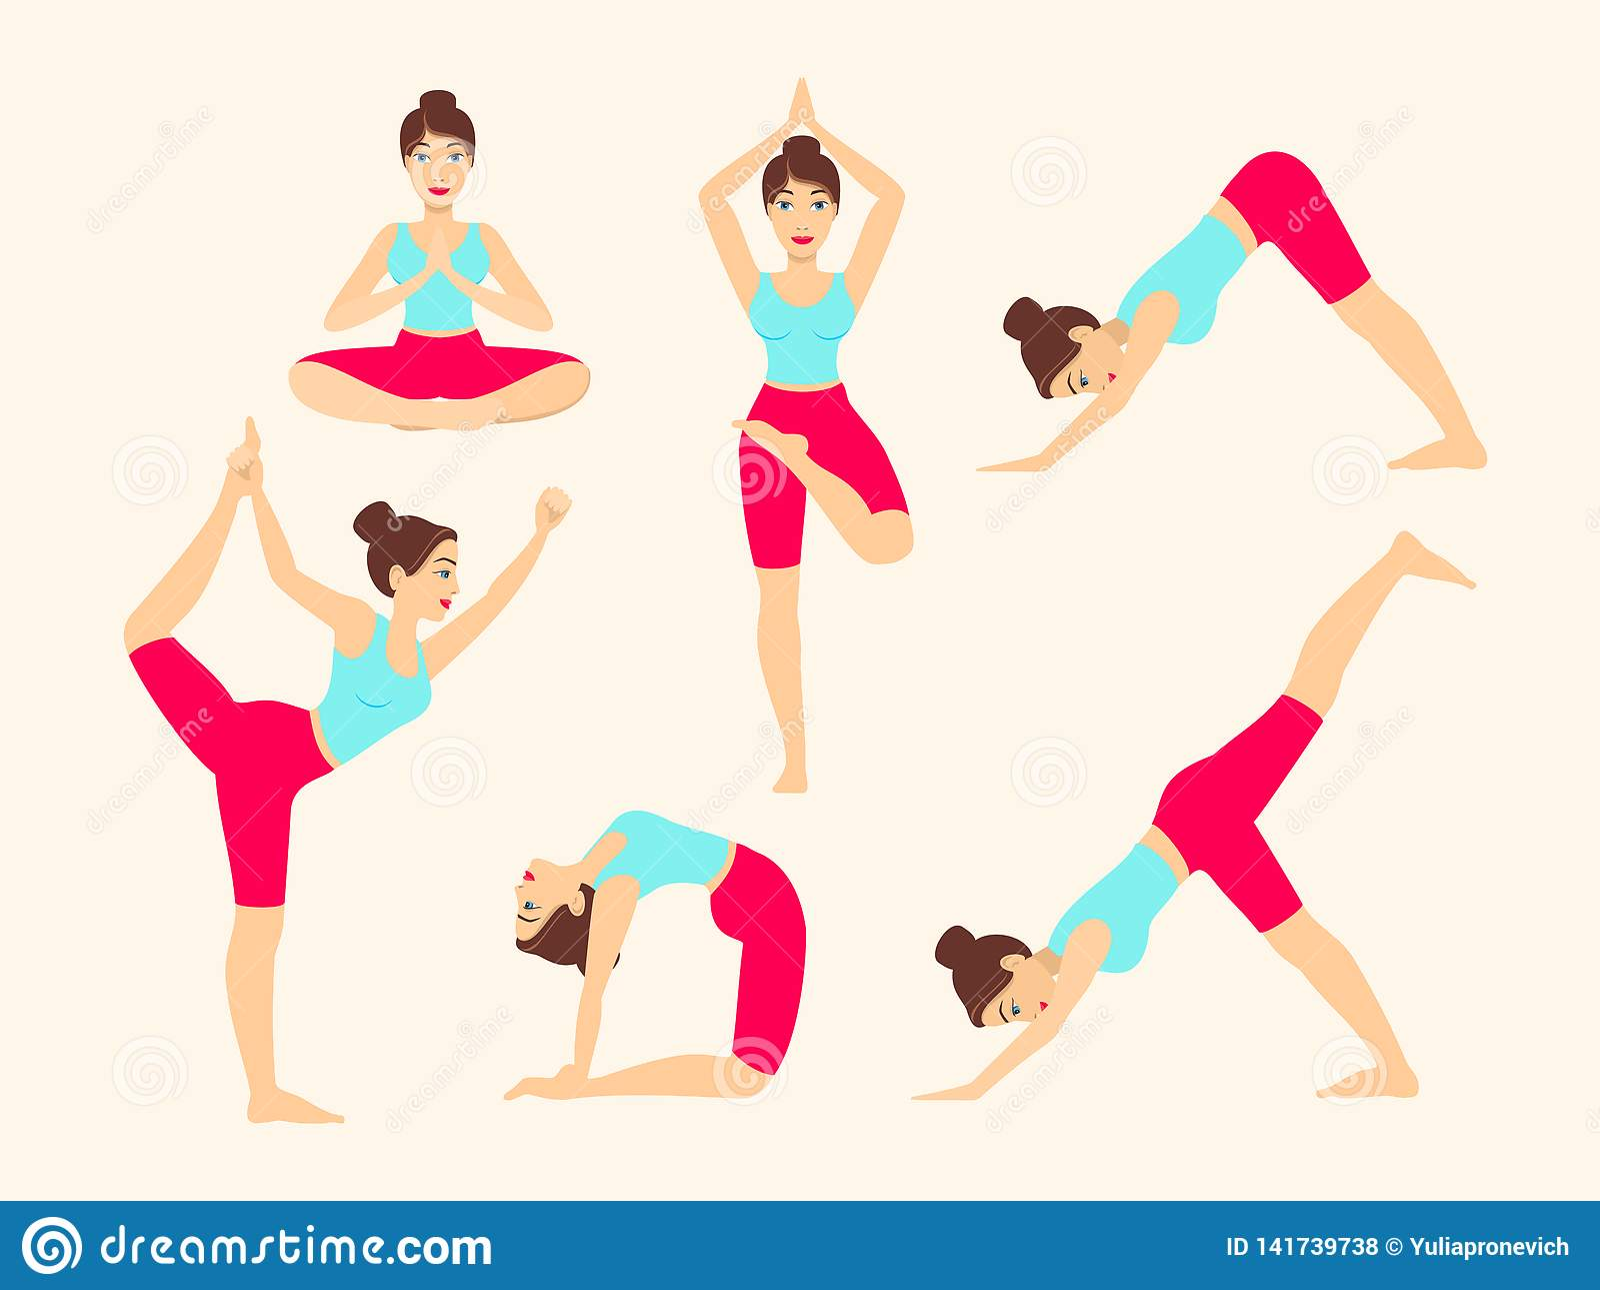 Yoga Poses Vector Free Download